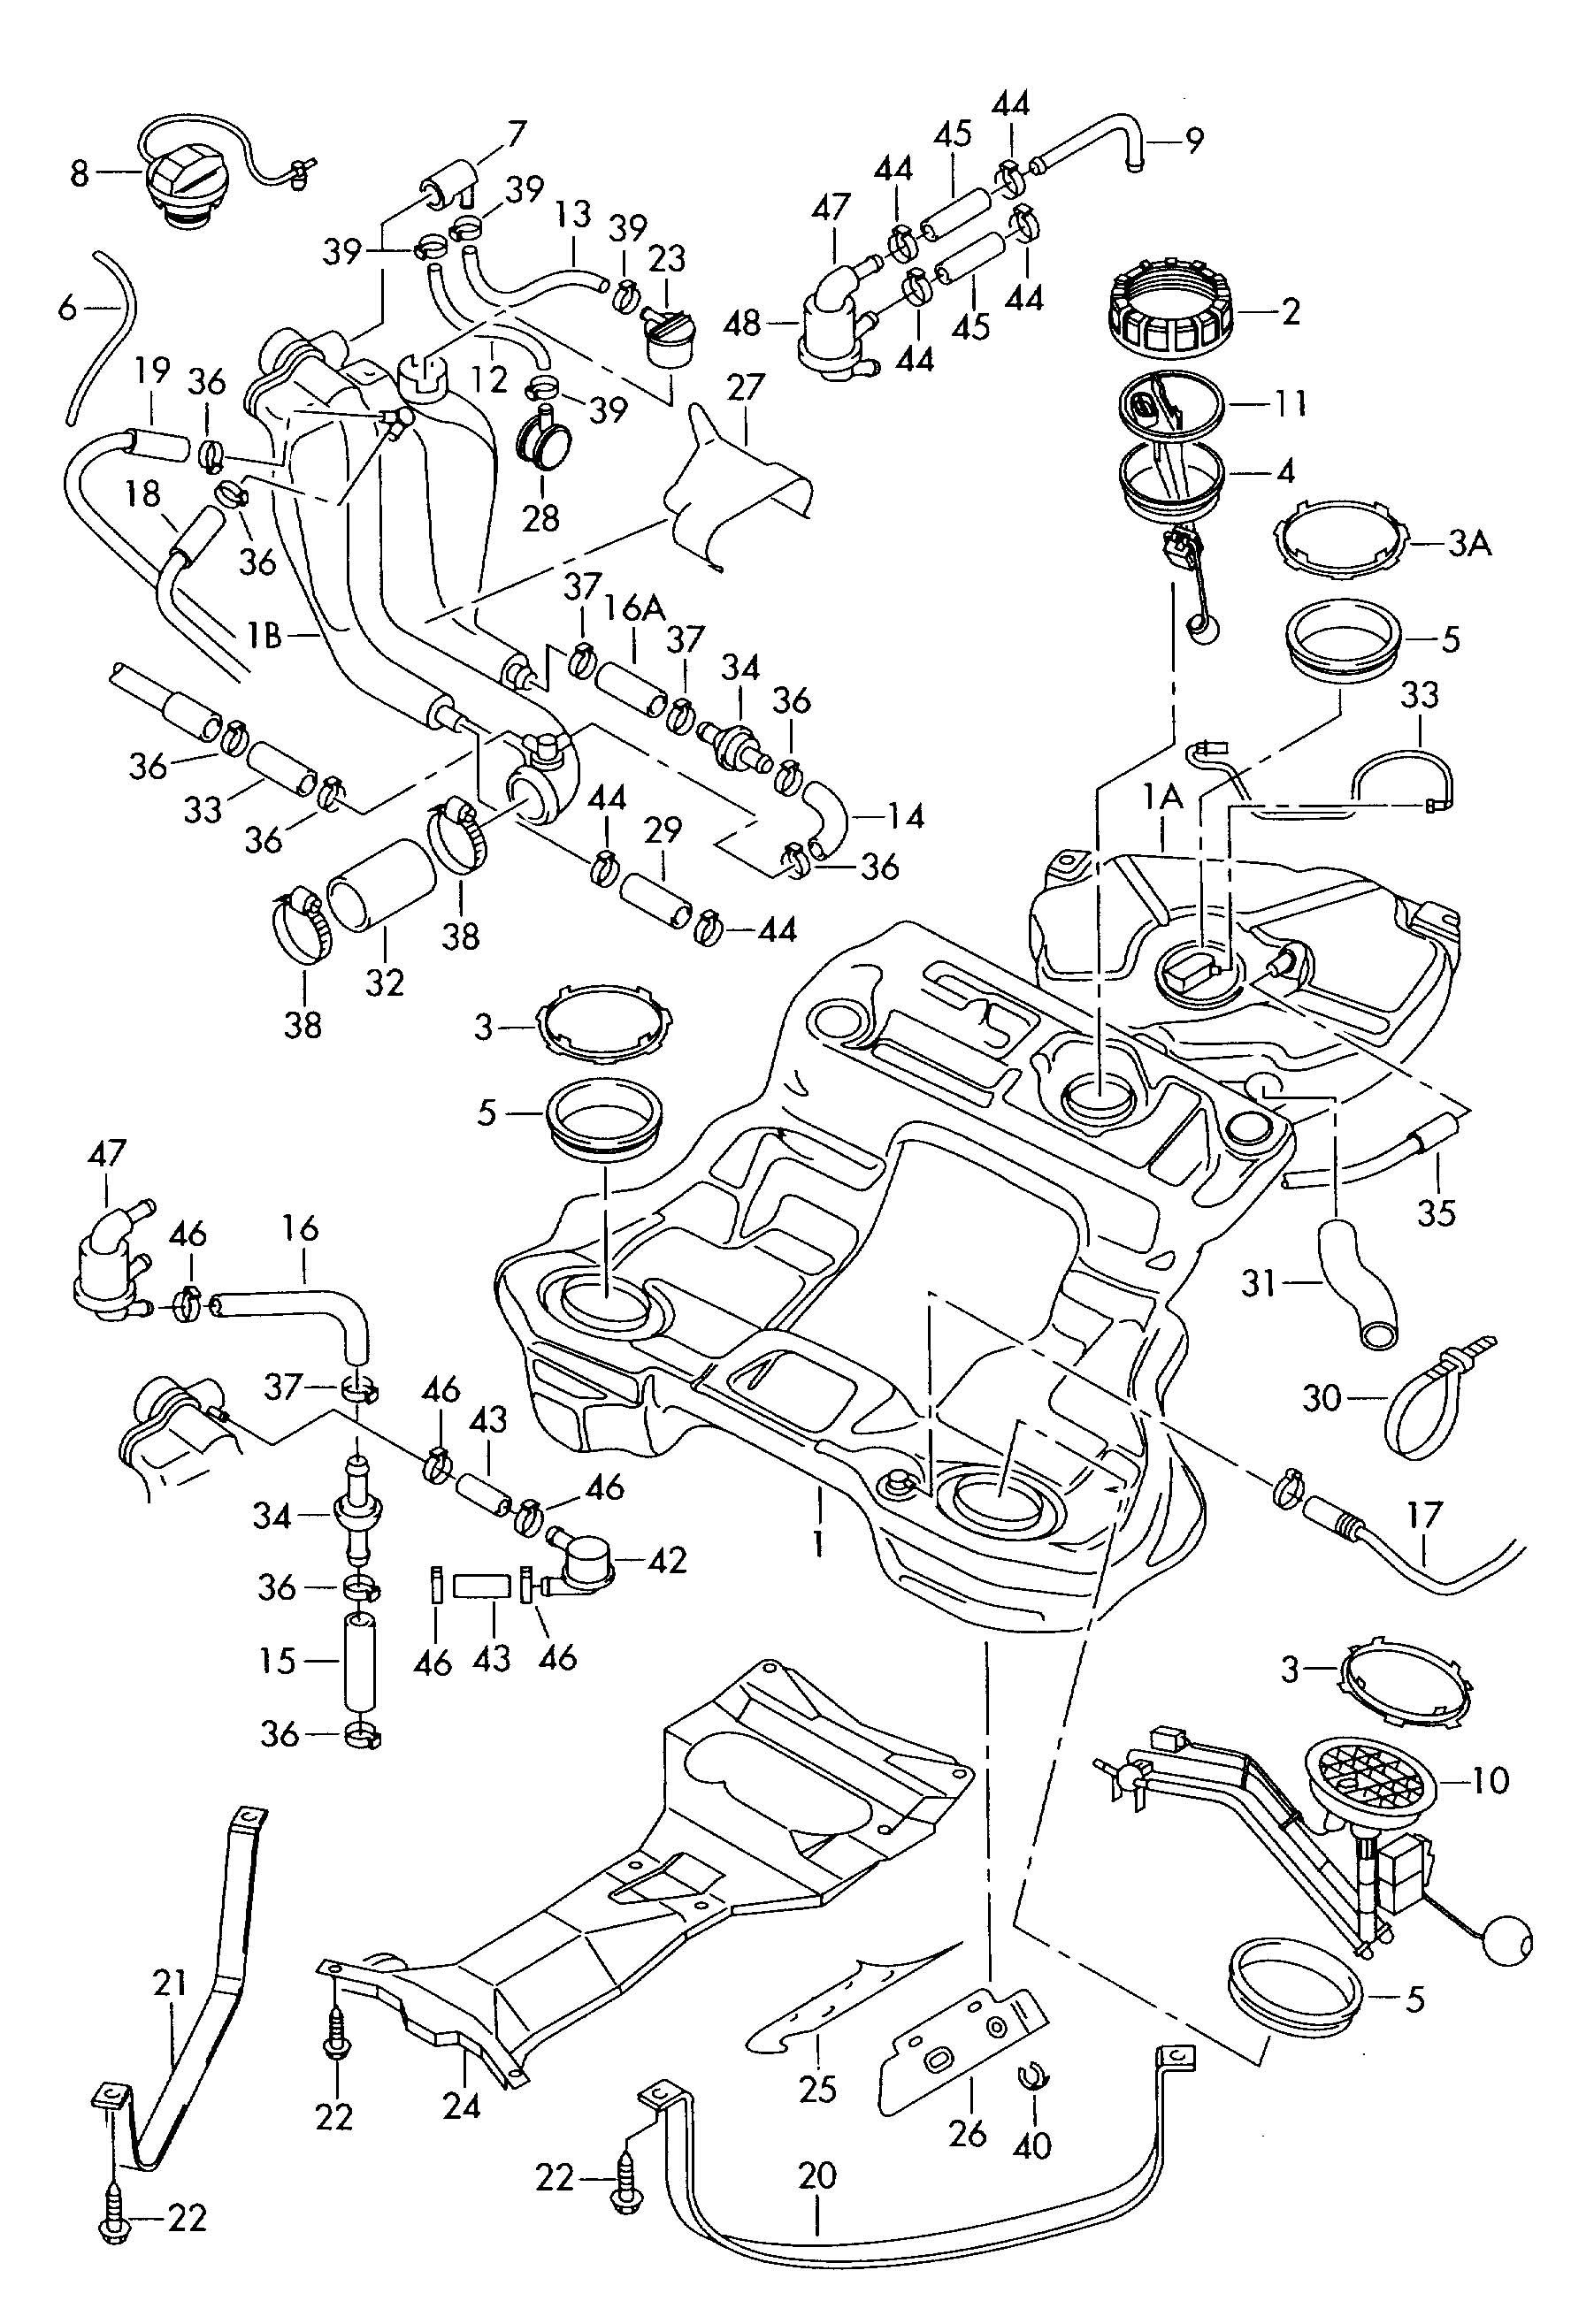 2002 volkswagen passat fuel tank. Black Bedroom Furniture Sets. Home Design Ideas